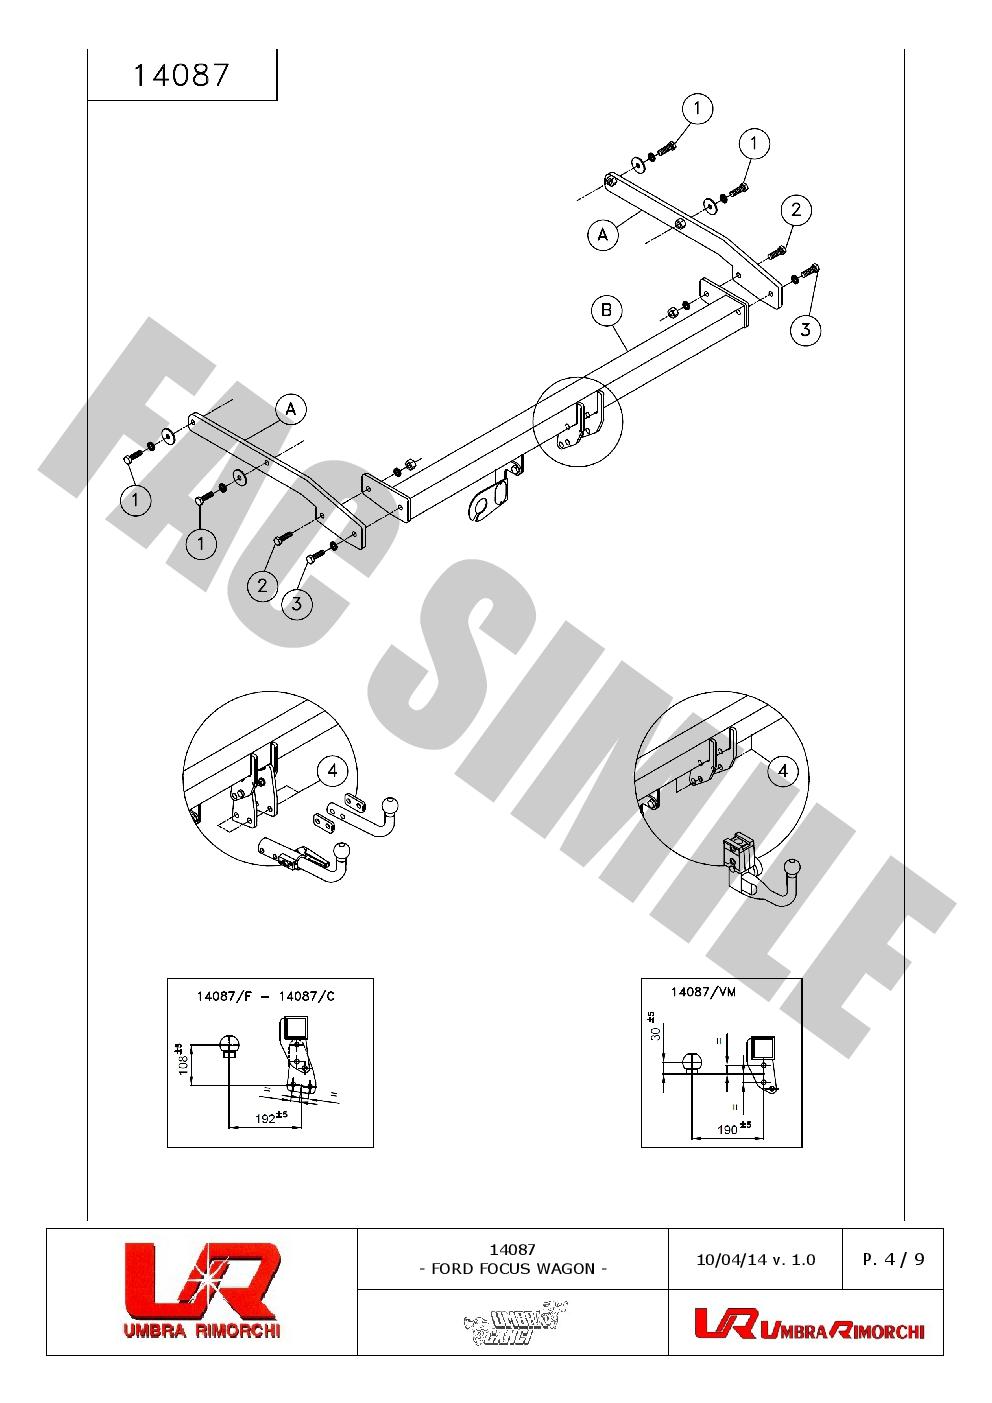 AHK Vertikale Anhängerkupplung 7p C2 E-Satz Ford Focus Wagon 11-18 14087/_B1